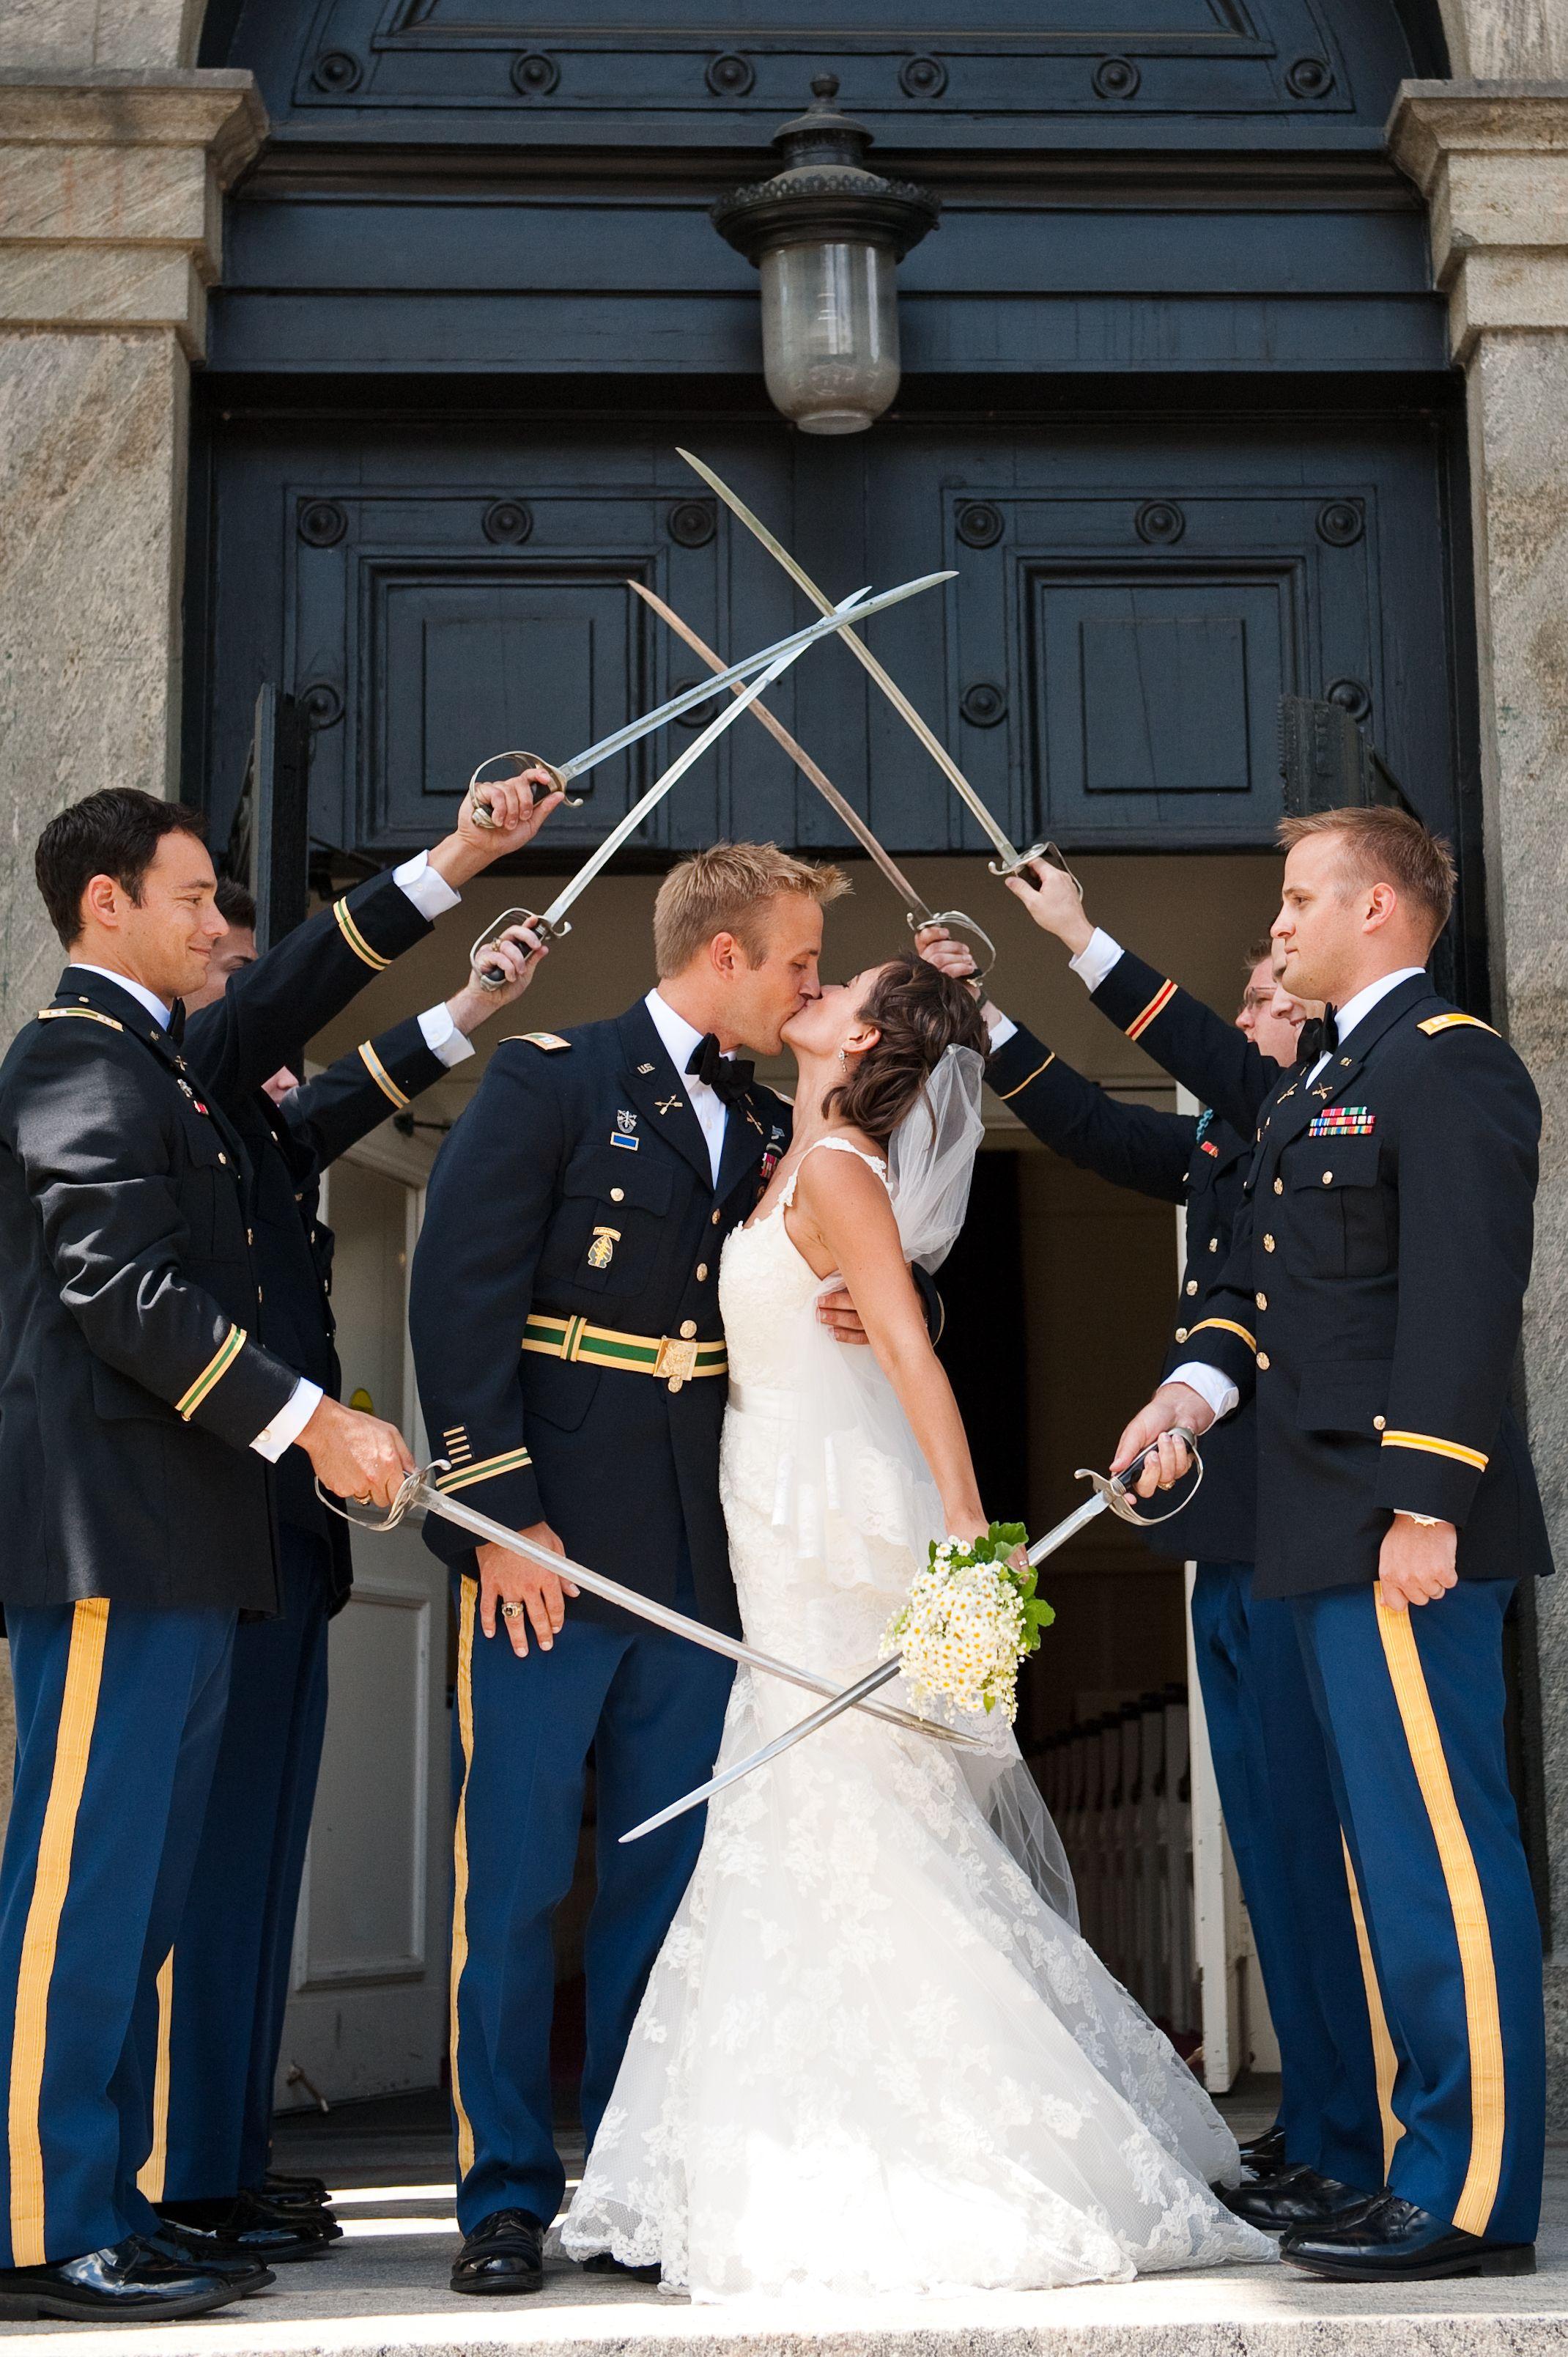 Marmalade Wedding Sabre Arch Photo By Sara Of Growing Tree Photography Army Wedding Military Wedding Marine Wedding [ 3216 x 2140 Pixel ]